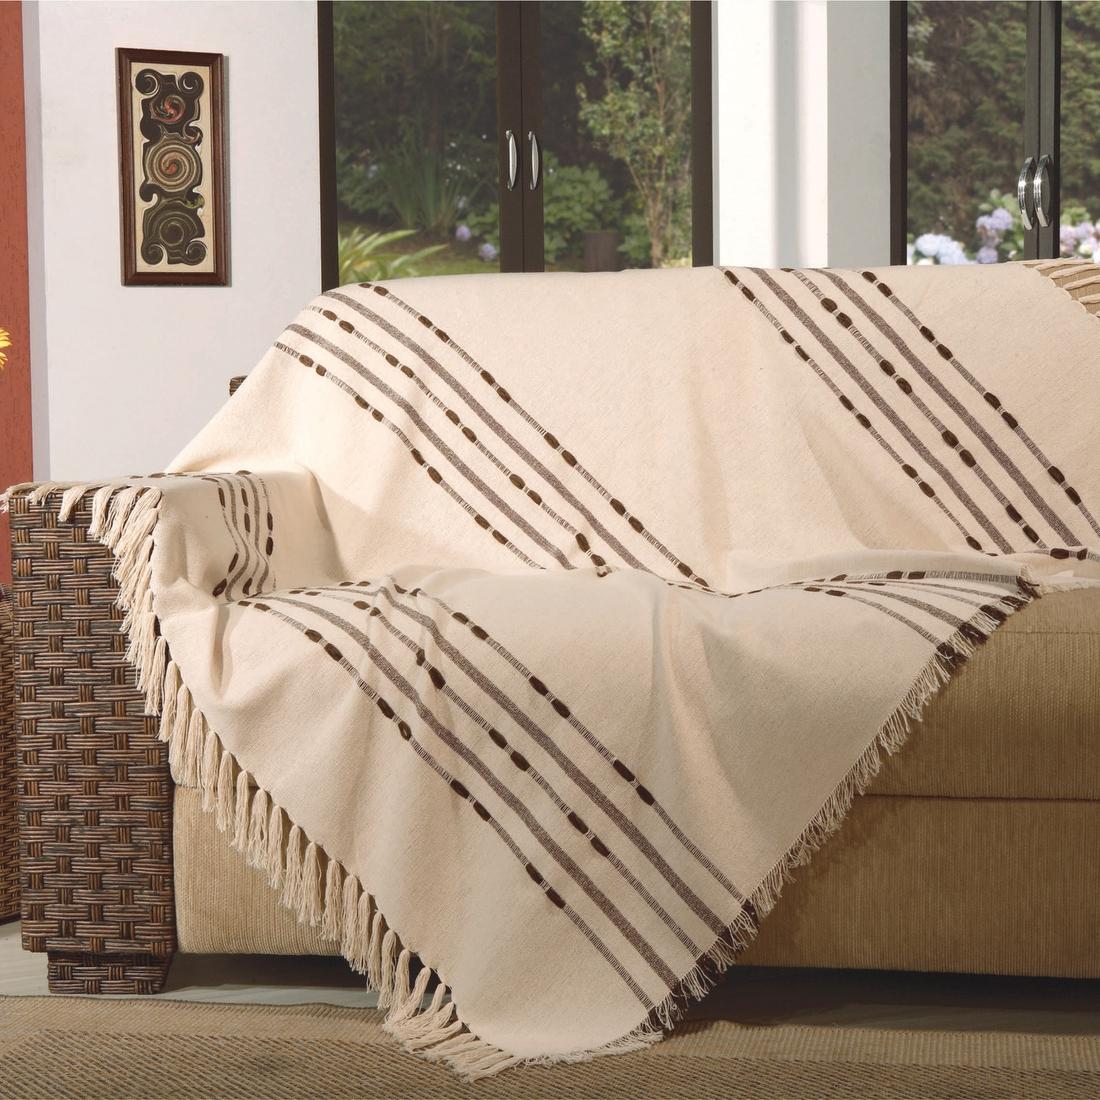 Manta sofa Zwdg Manta Para sofa Pegasus 200x150cm Tabaco Fastlar